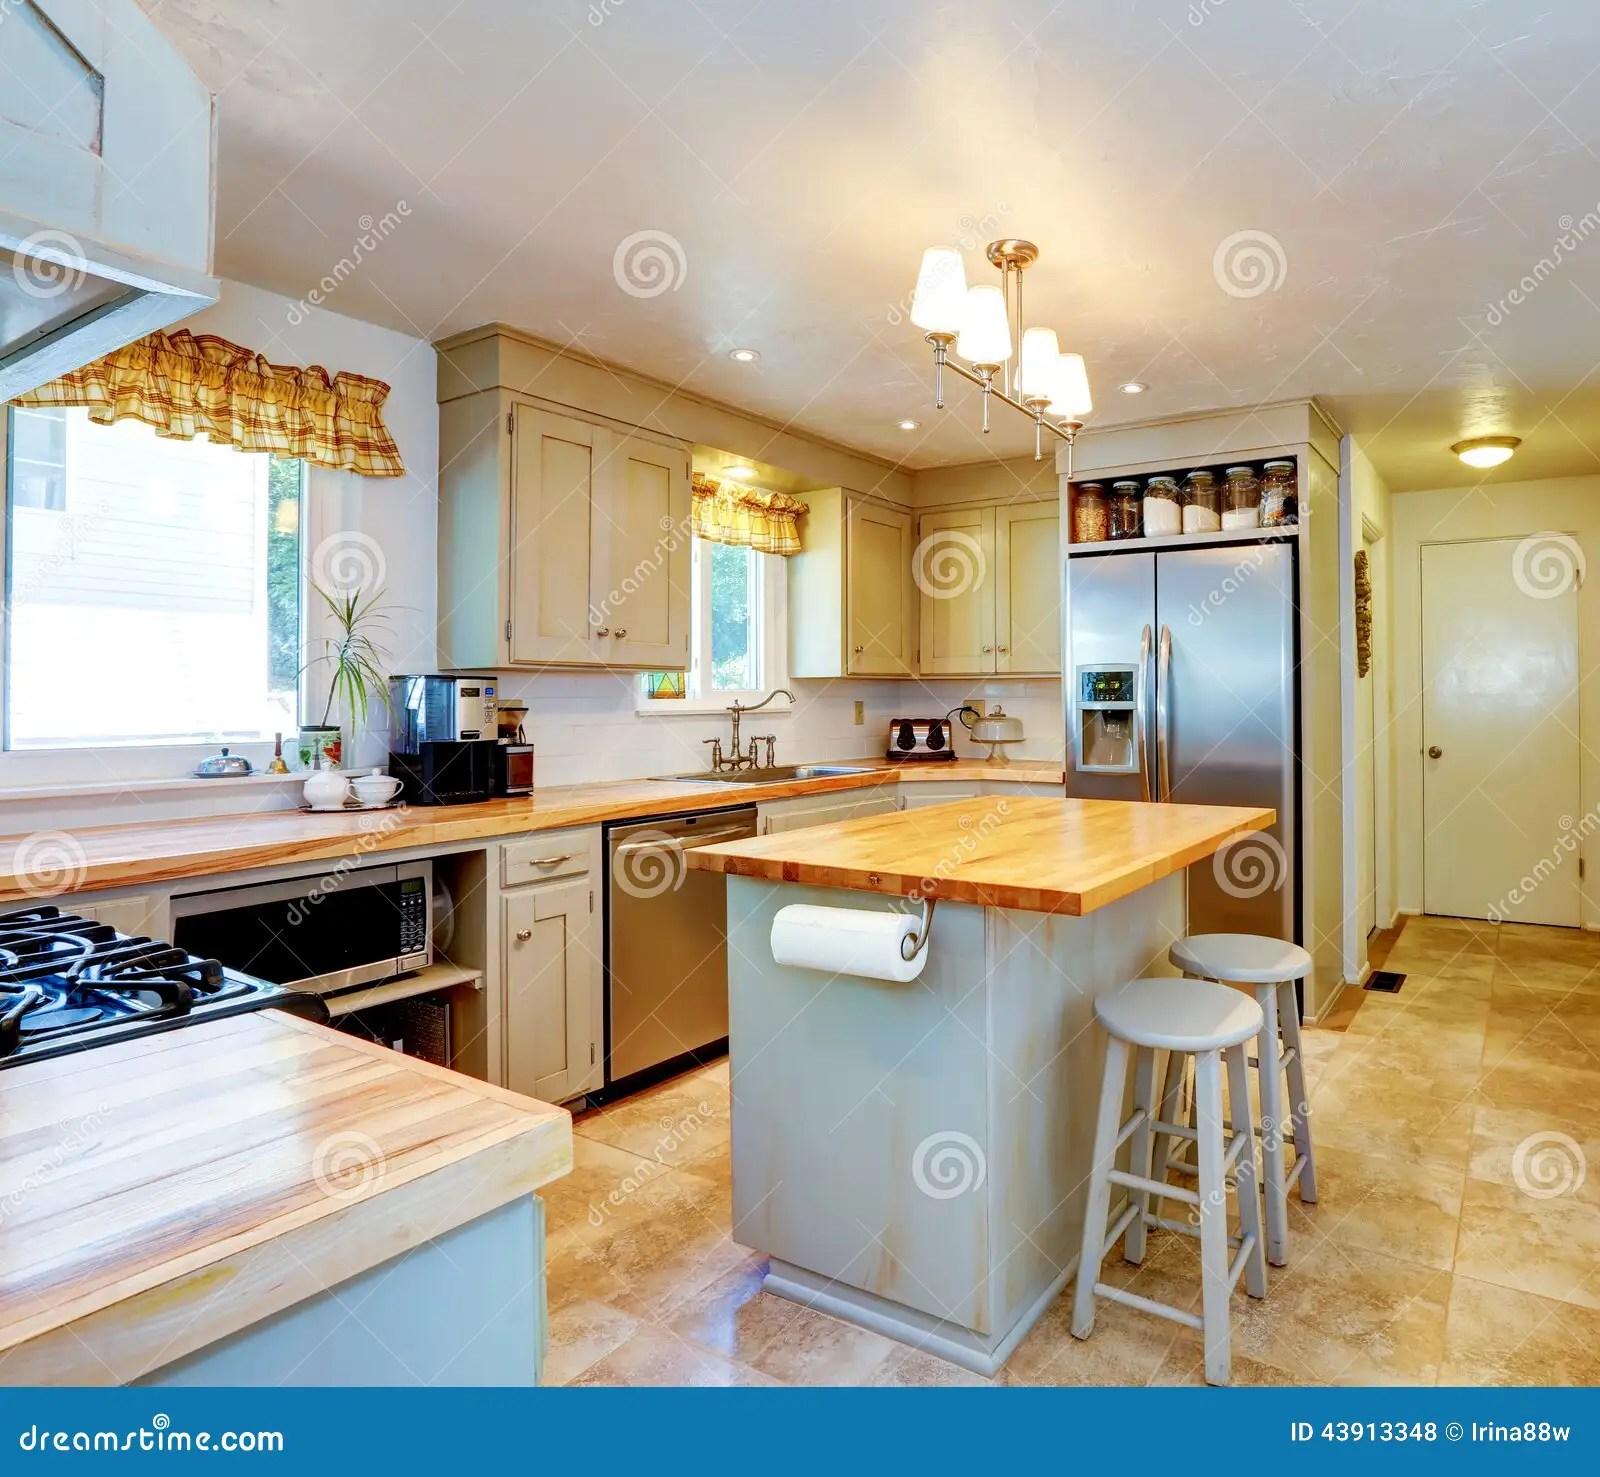 industrial kitchen stools whisk 美国房子内部有海岛和凳子的厨房库存照片 图片包括有家具 瓦片 木头 有厨房 ss装置和米黄砖地的厨房室